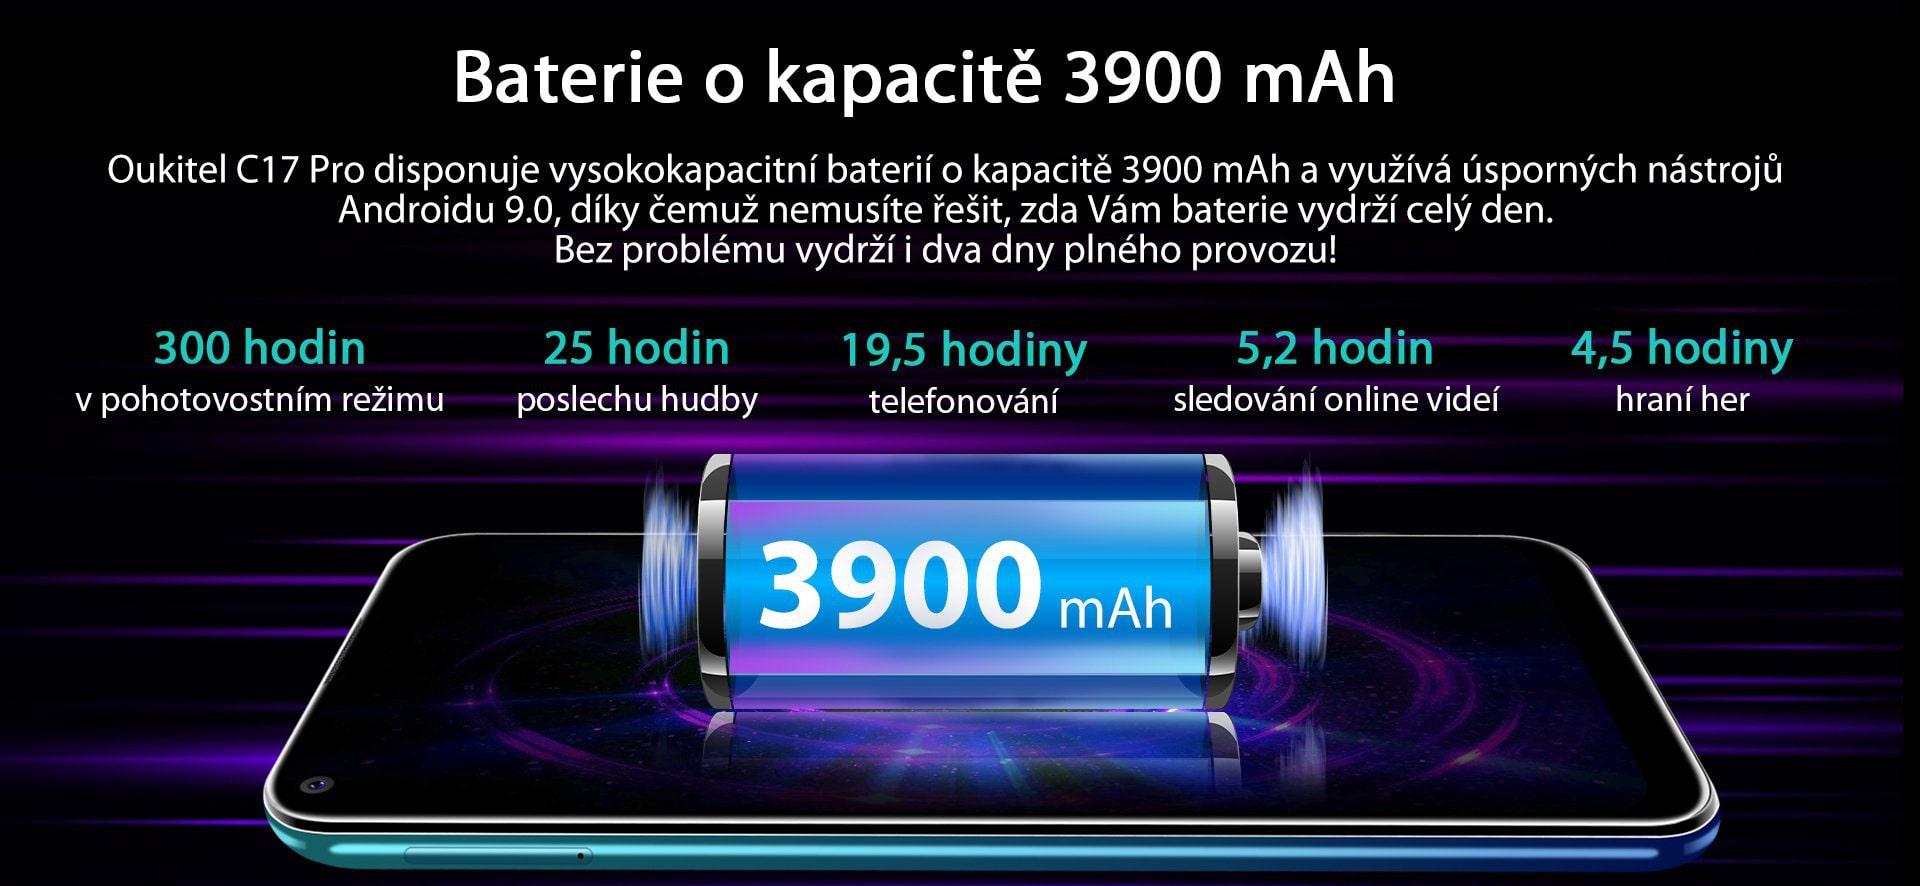 Oukitel-C17-Pro-baterie